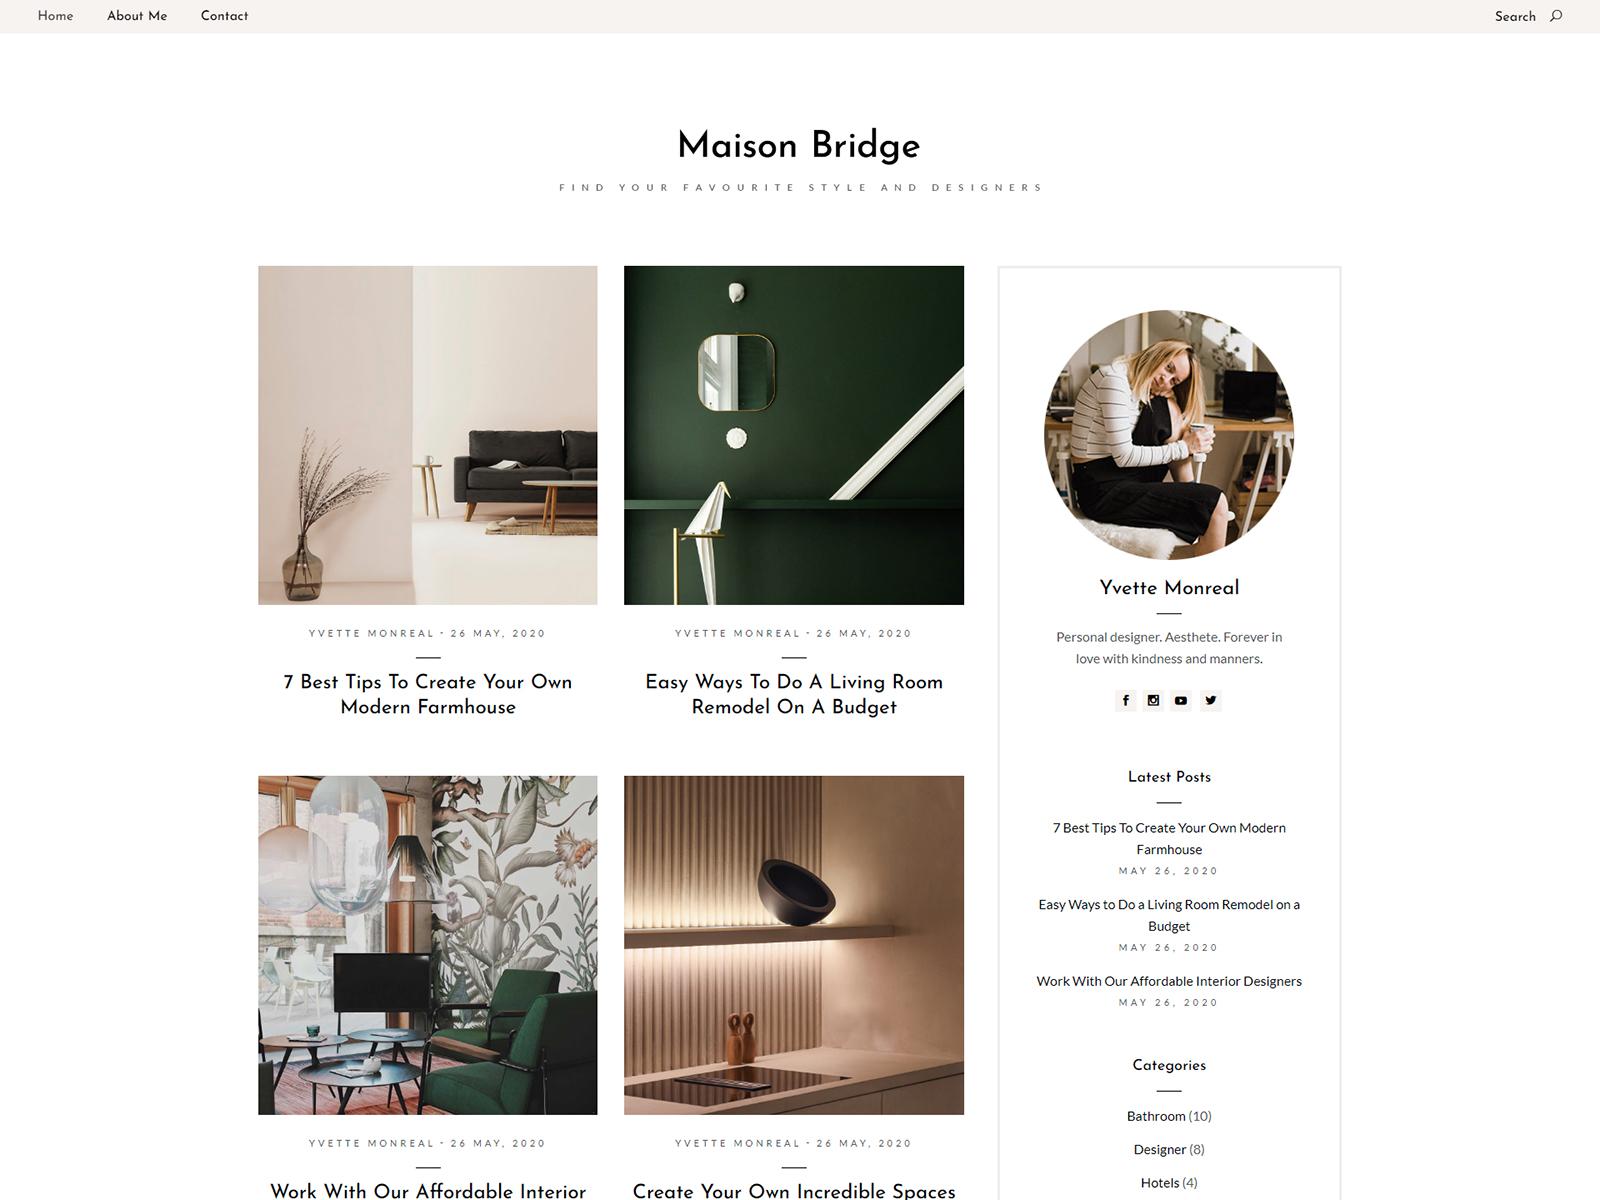 Interior Design Blog By Svetlana Vucic For Qode Interactive On Dribbble